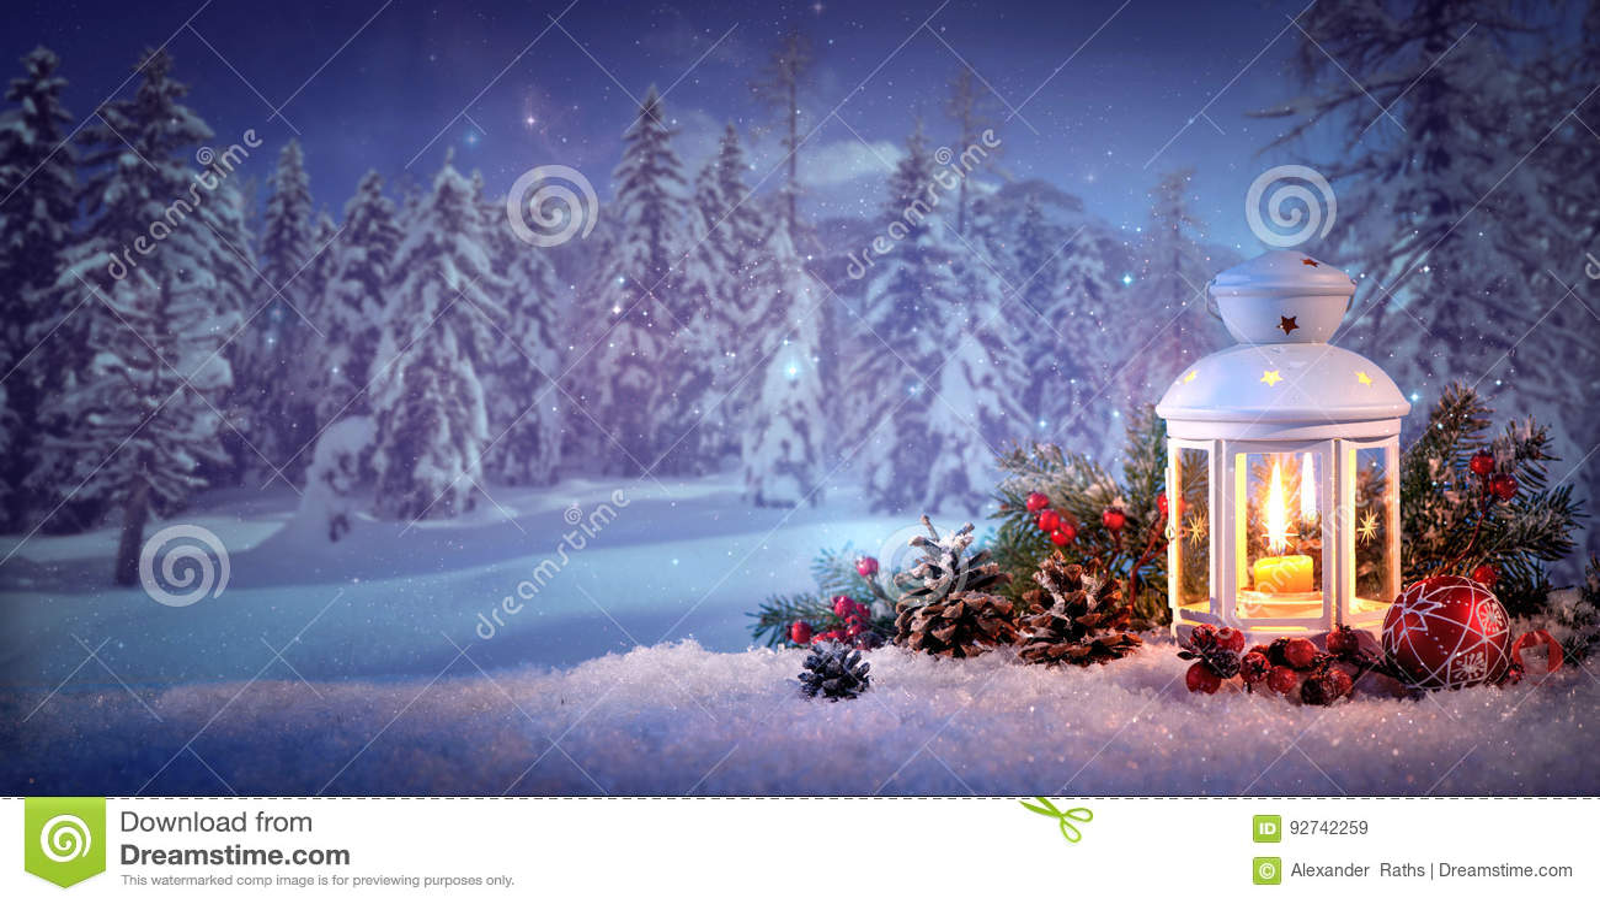 Brandende lantaarn in de sneeuw